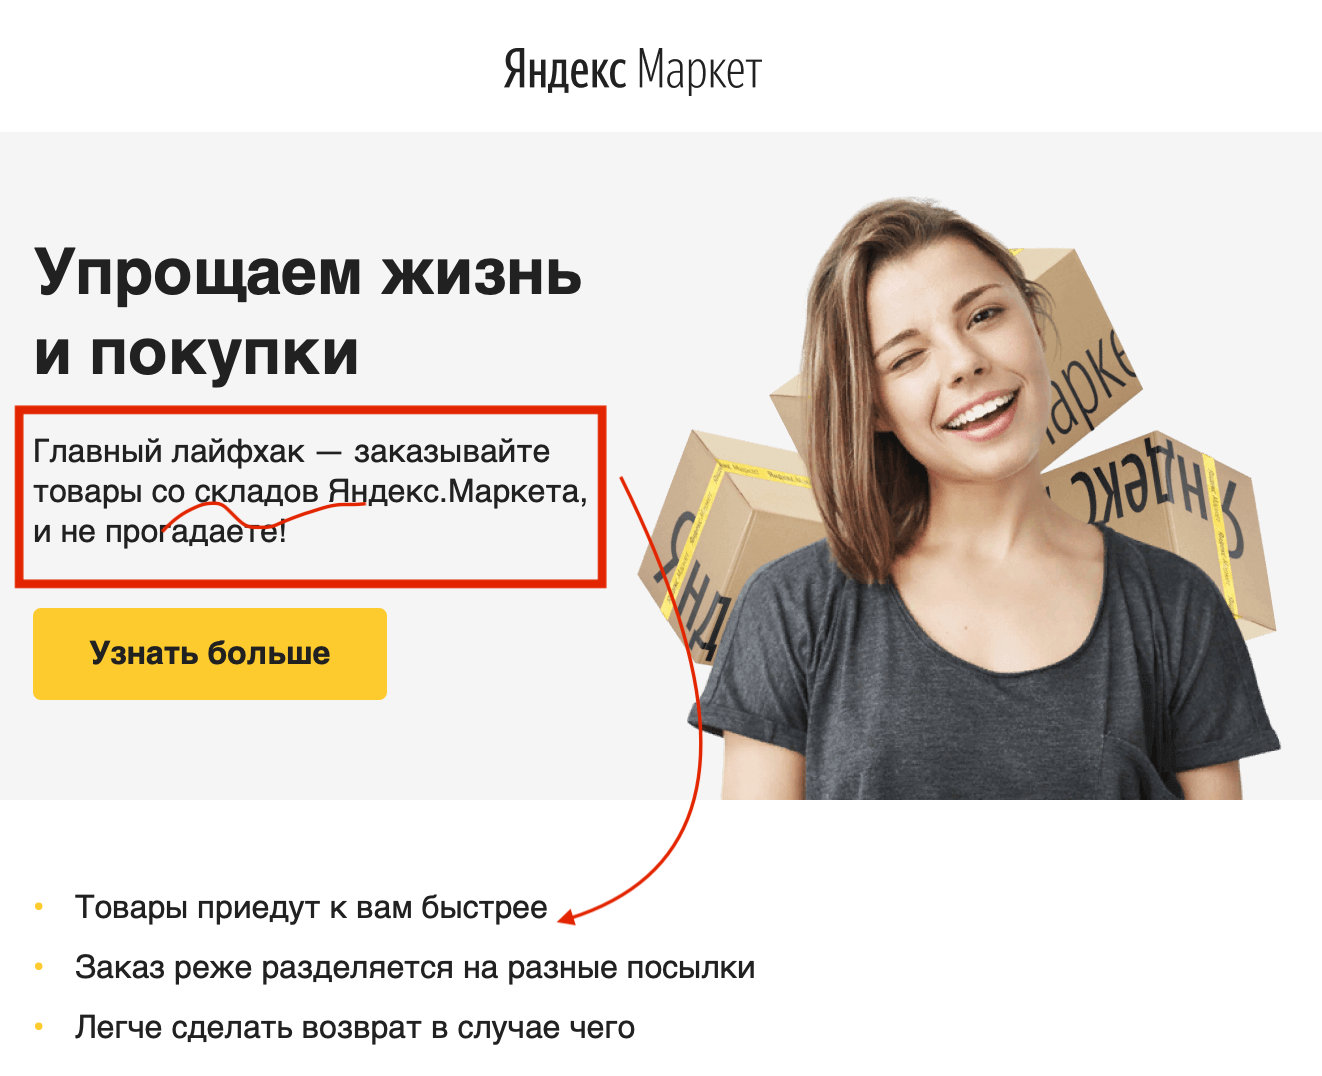 Яндекс.Маркет. Честная конкуренция.